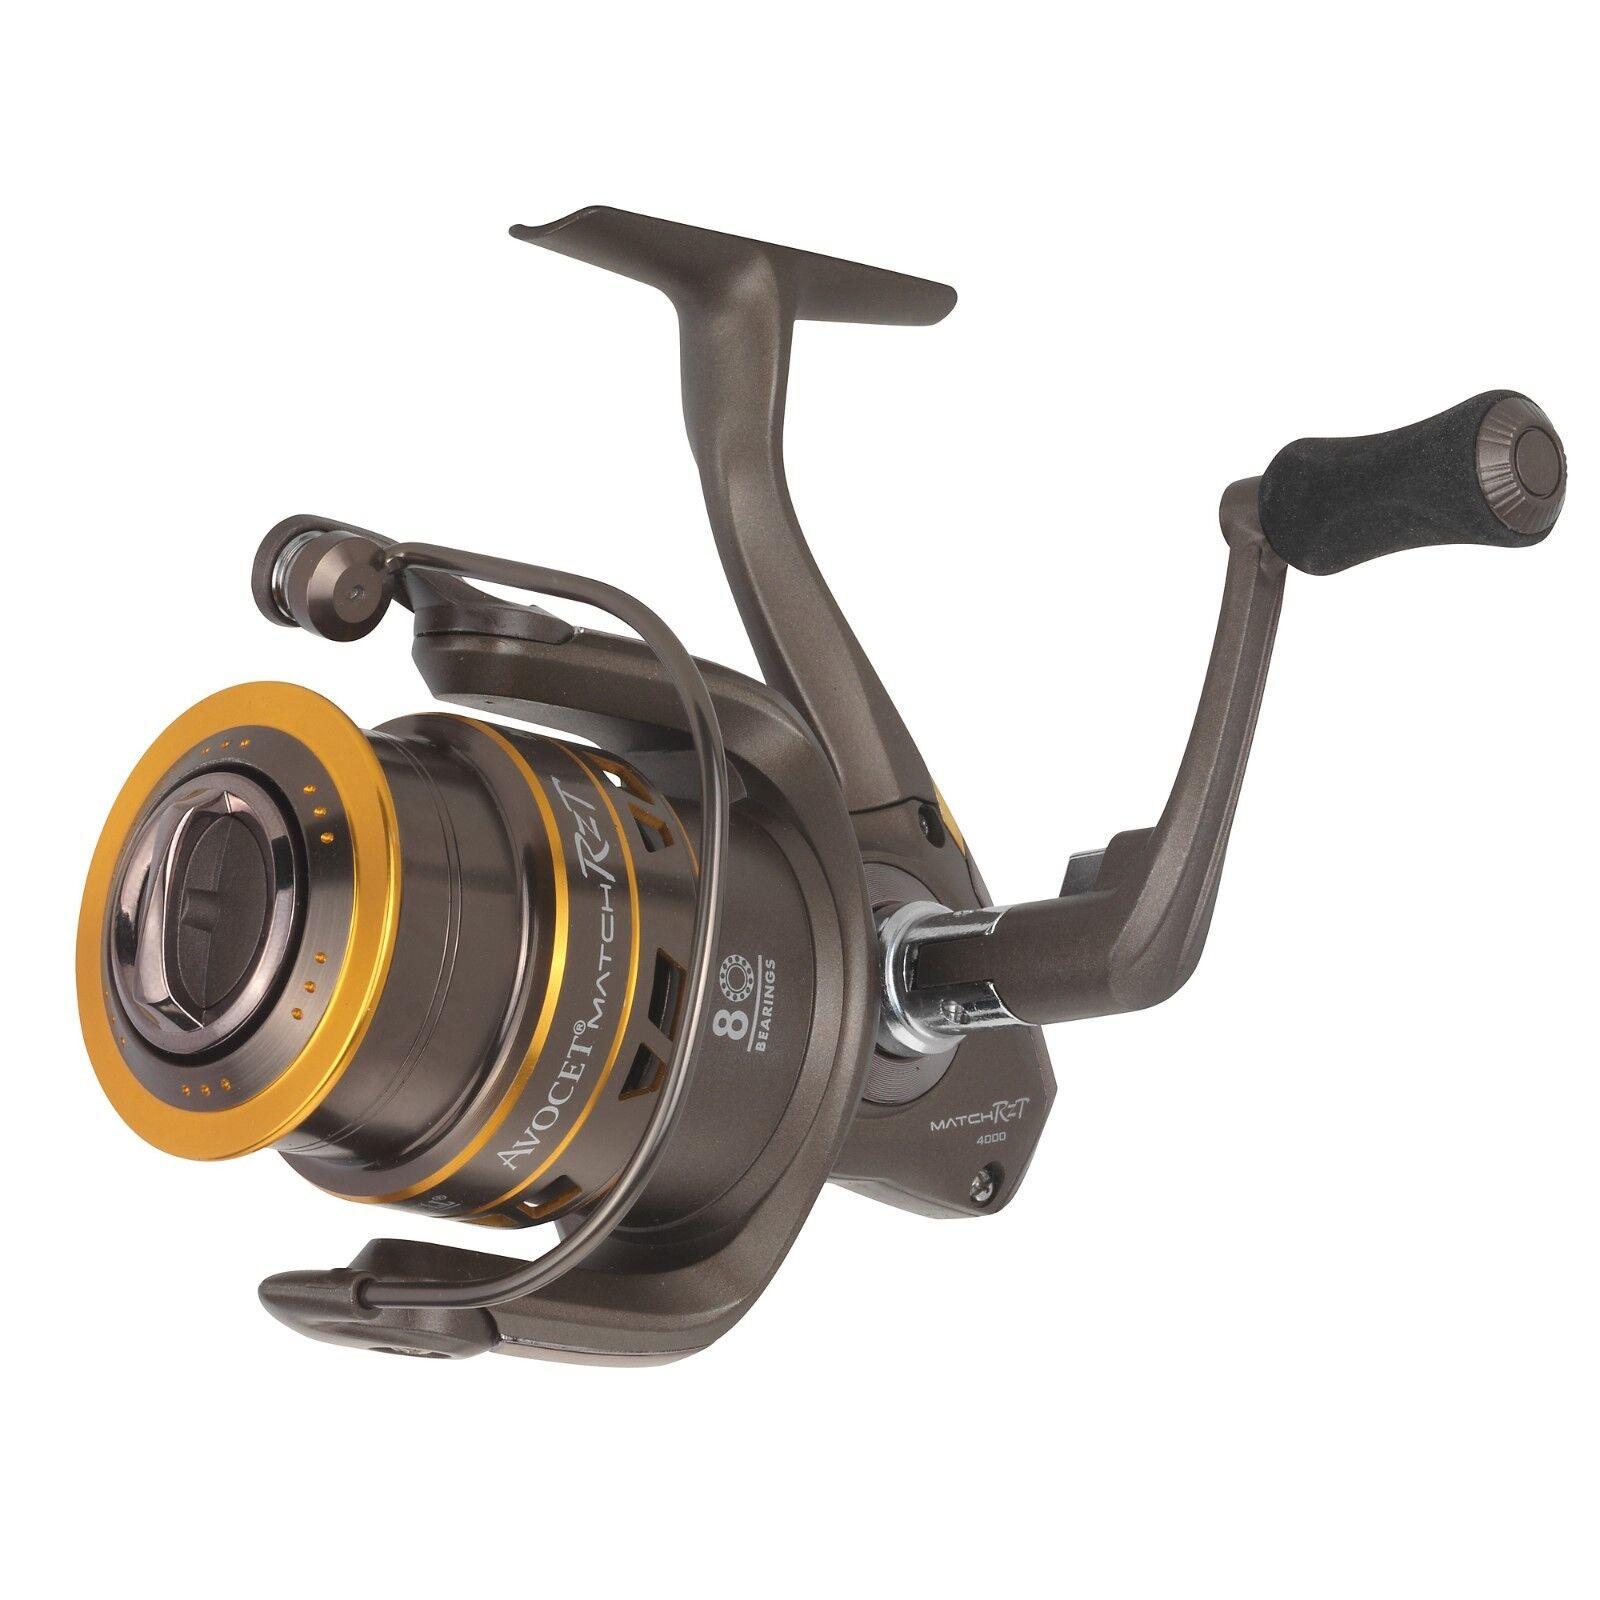 Mitchell NEW Avocet Match Fishing Reel RZT 4000 FD - 1428053